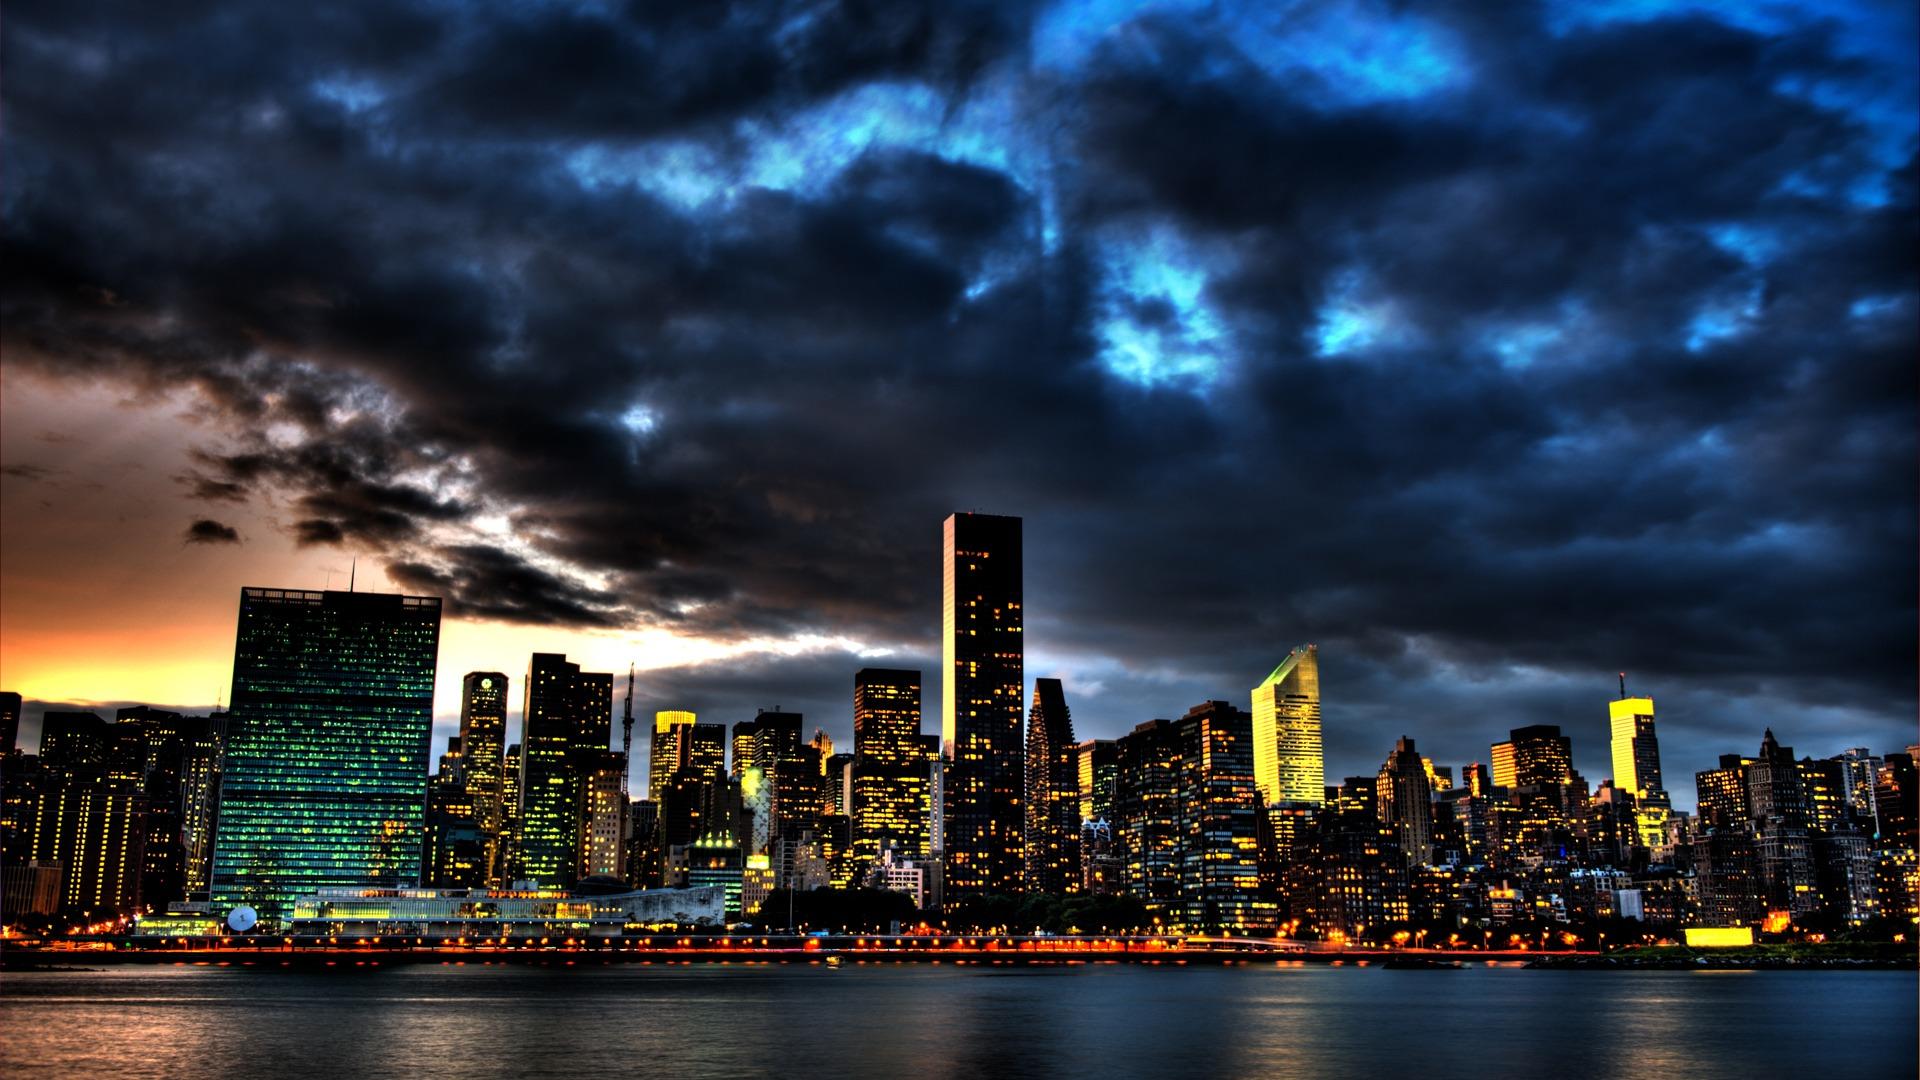 New York City Skyline 1080p Wallpaper City HD Wallpapers | Wide Screen ...